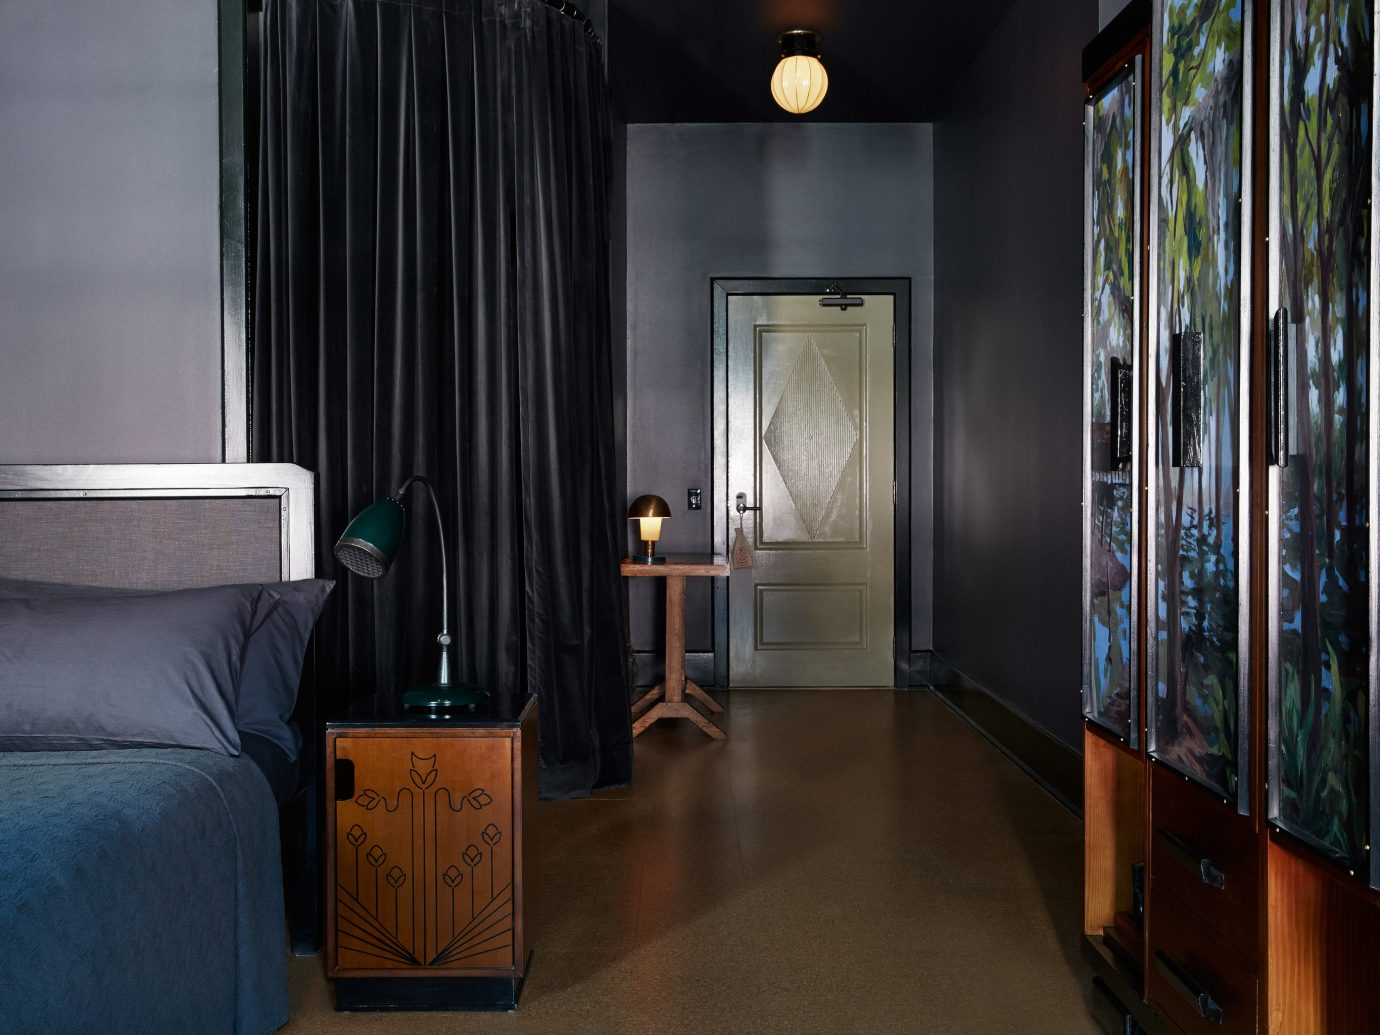 Hotels indoor floor room wall Living property house home interior design estate cottage apartment Suite furniture lamp